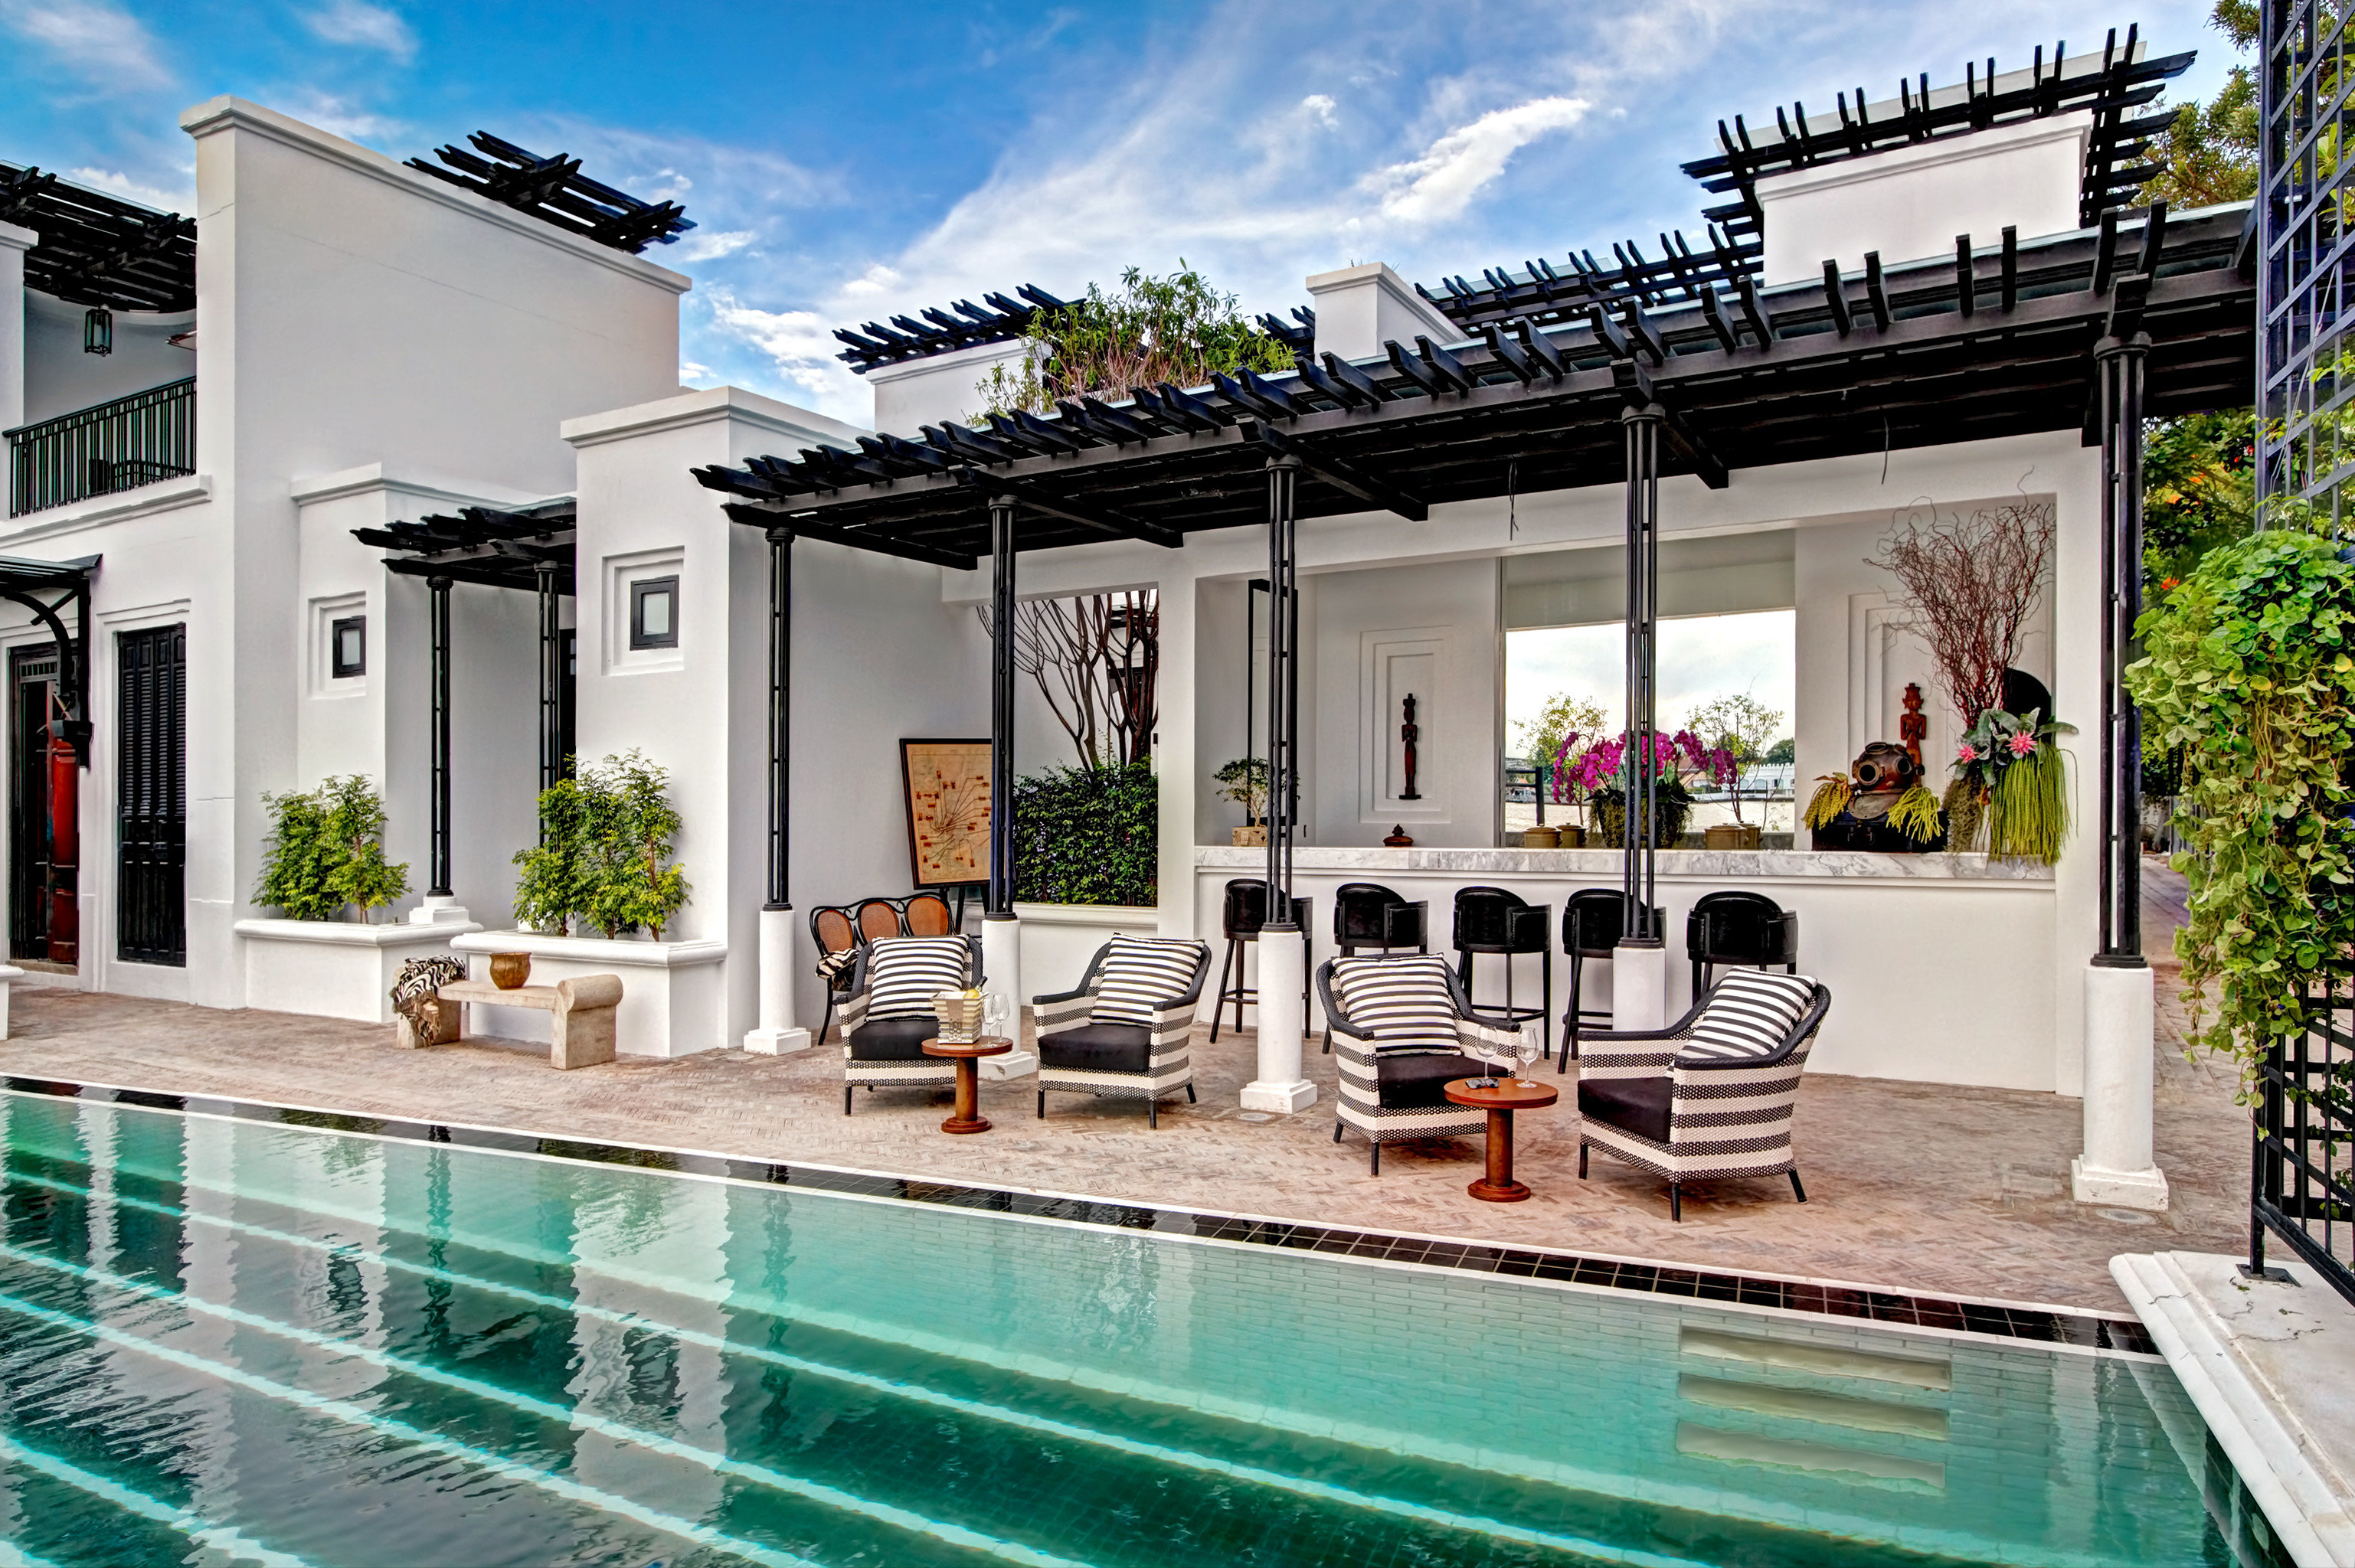 City Deck Hotels Luxury Pool Romance property condominium leisure swimming pool estate house home Villa vacation real estate interior design facade Resort mansion Design Courtyard apartment